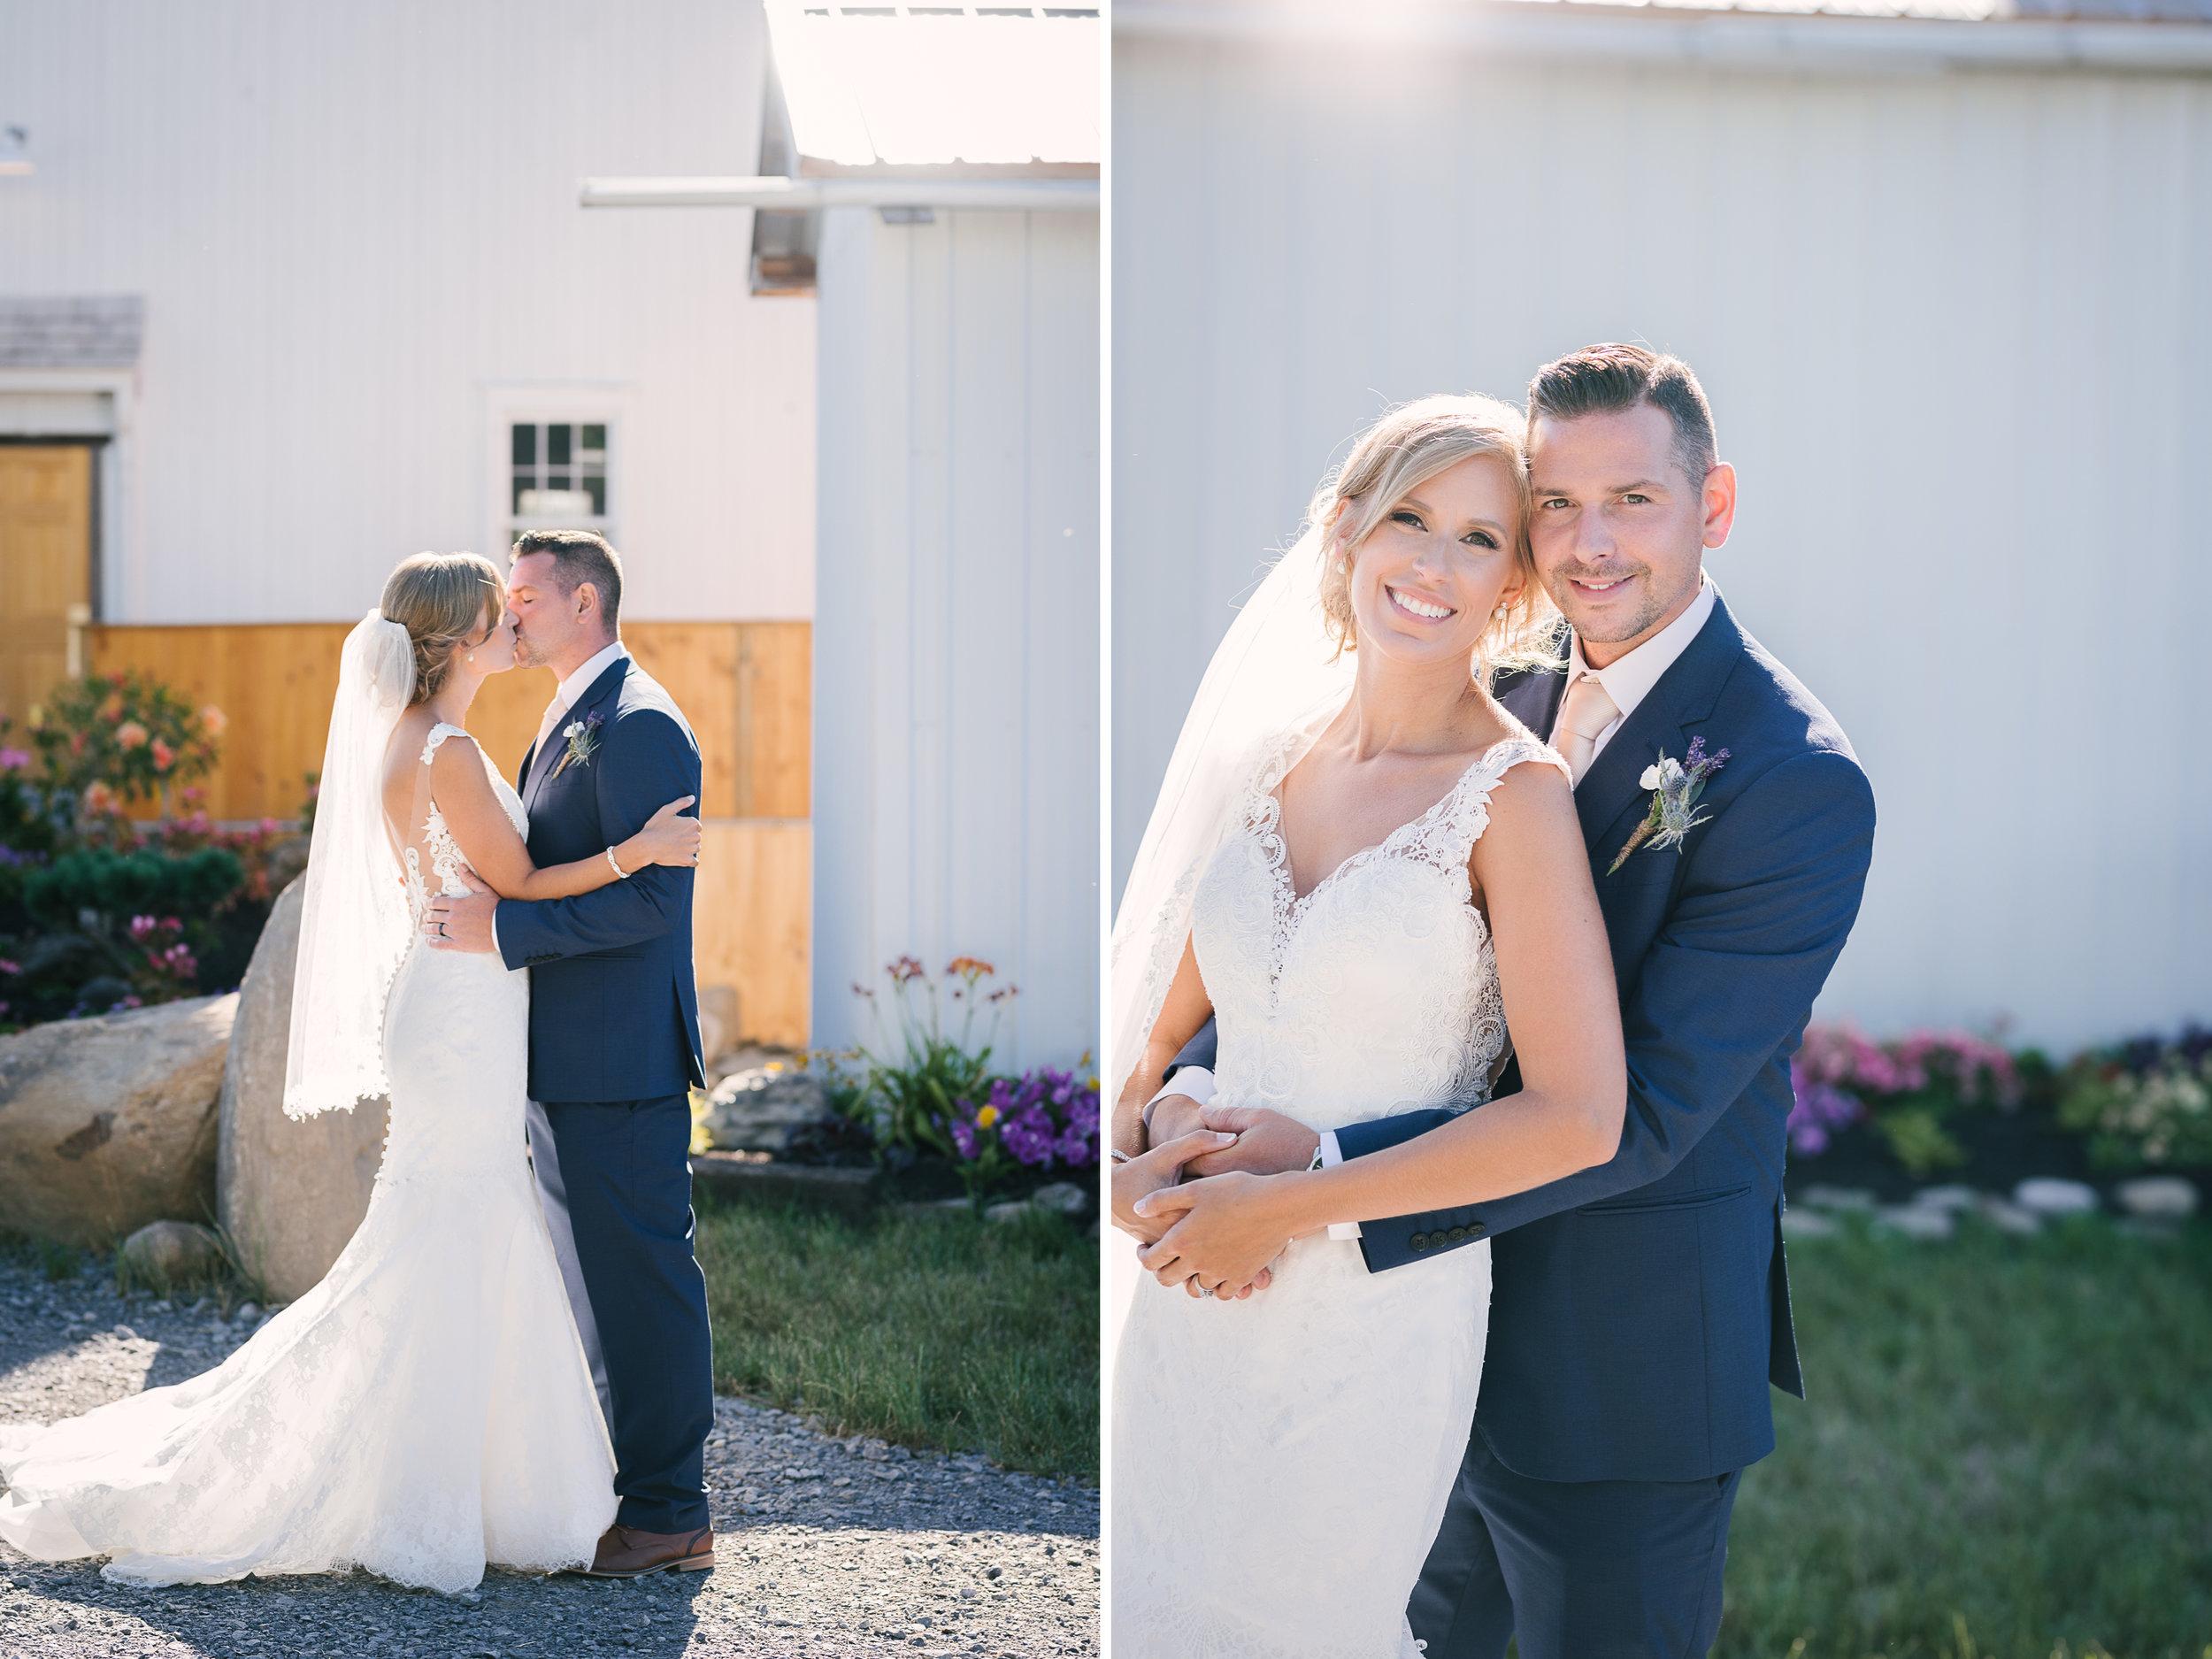 cobblestone-wedding-barn-rochester-photography-31.jpg